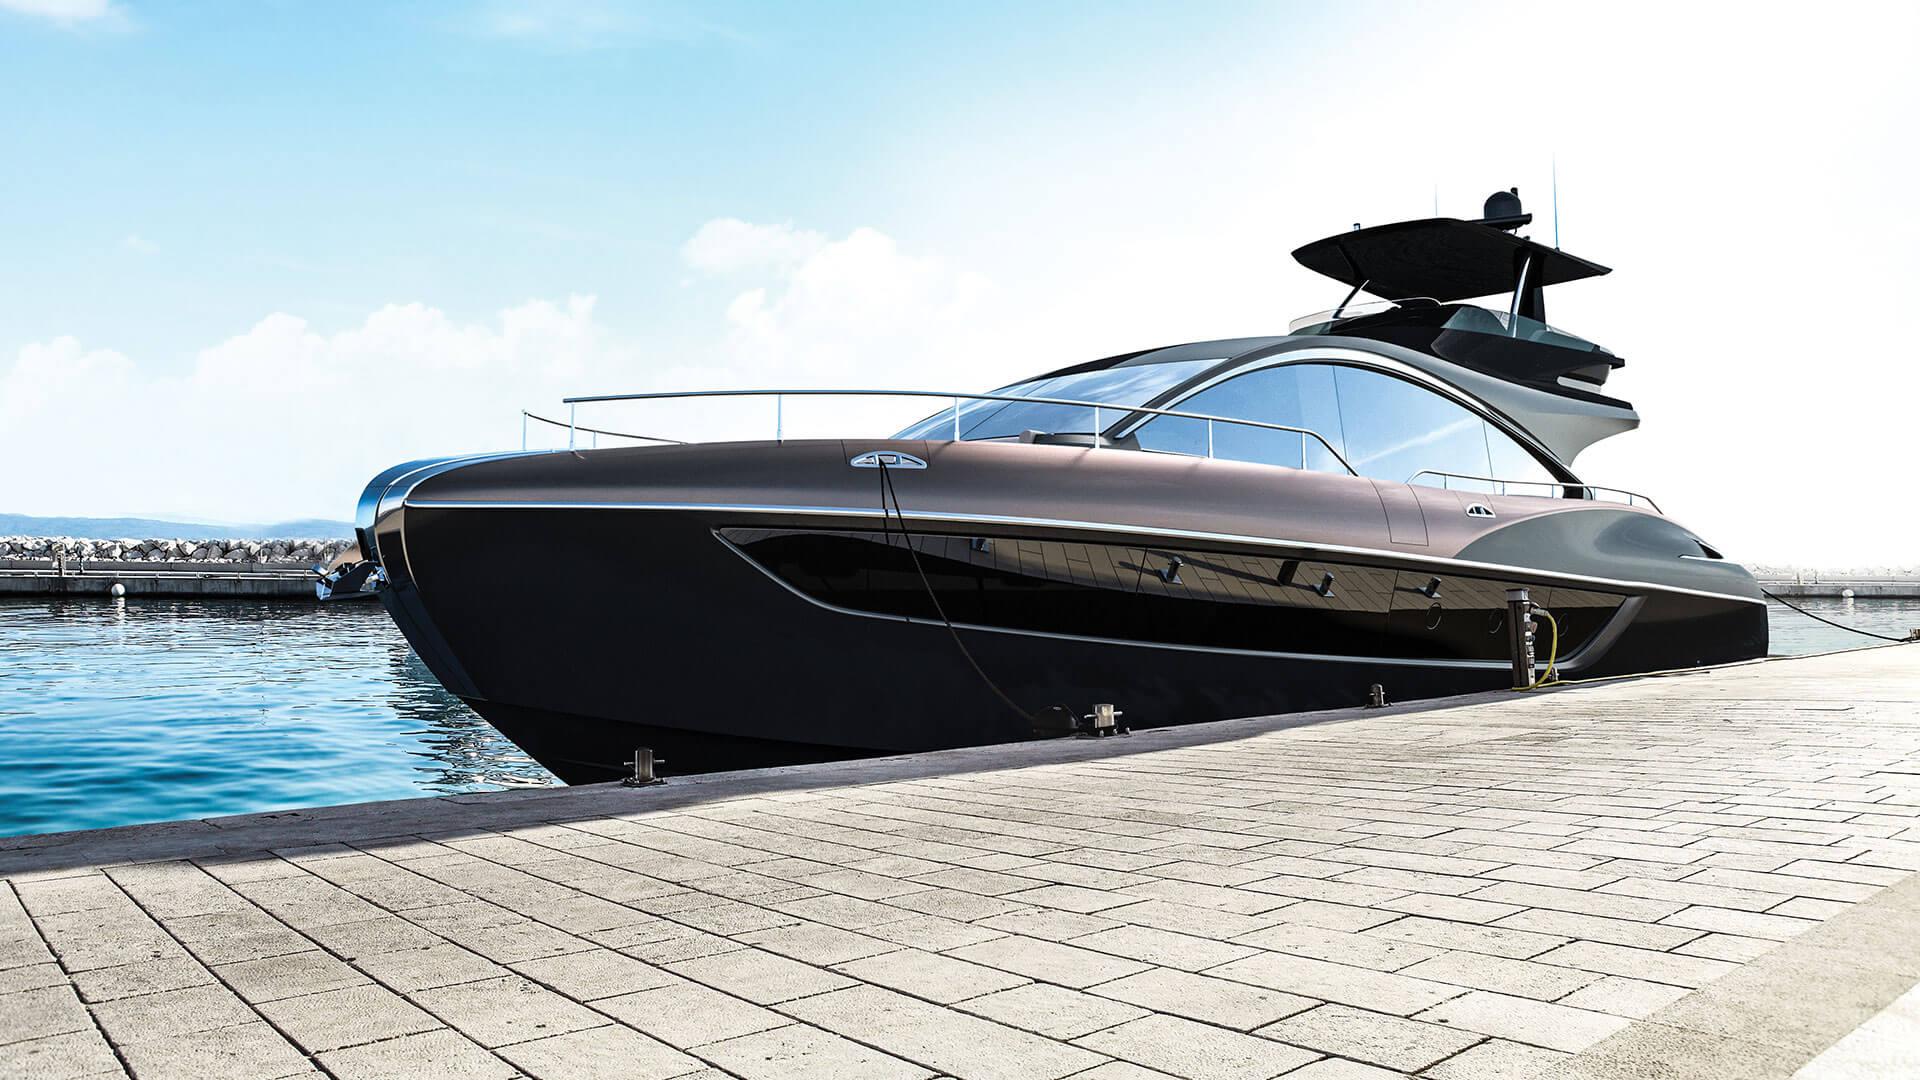 2019 lexus ly 650 luxury yacht gallery 10